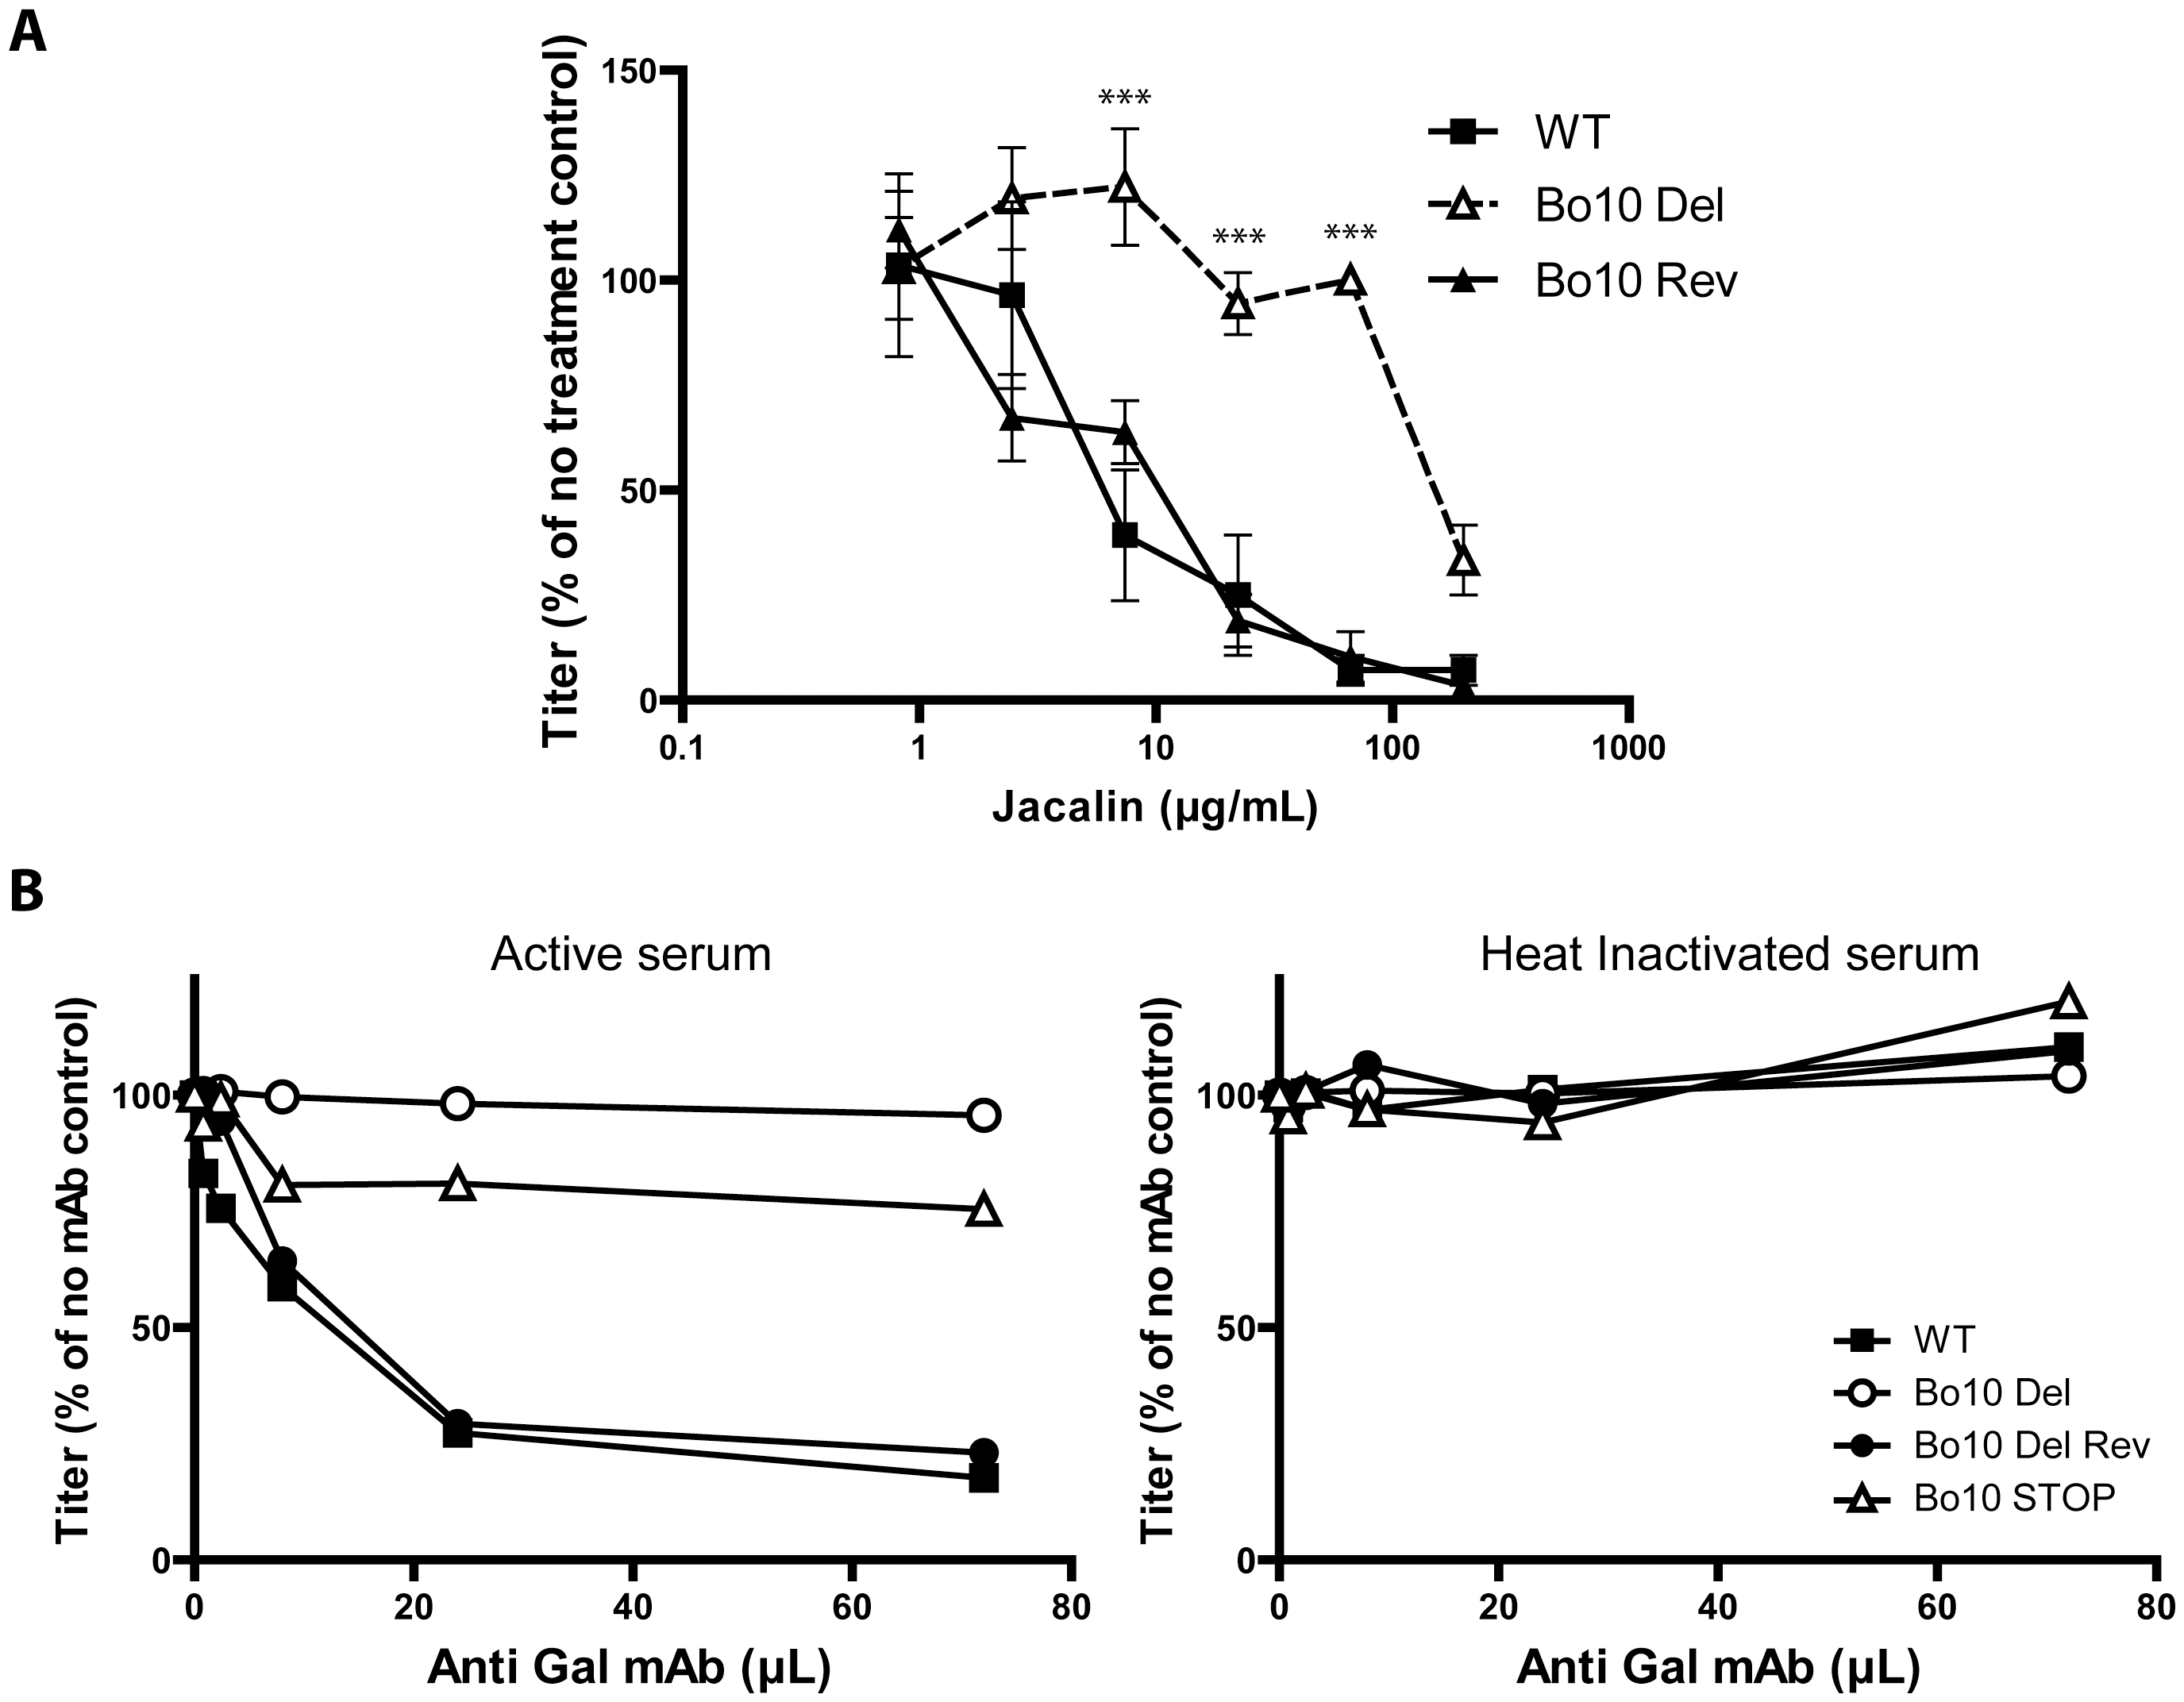 Glycans on BoHV-4 gp180 allow virus neutralization.